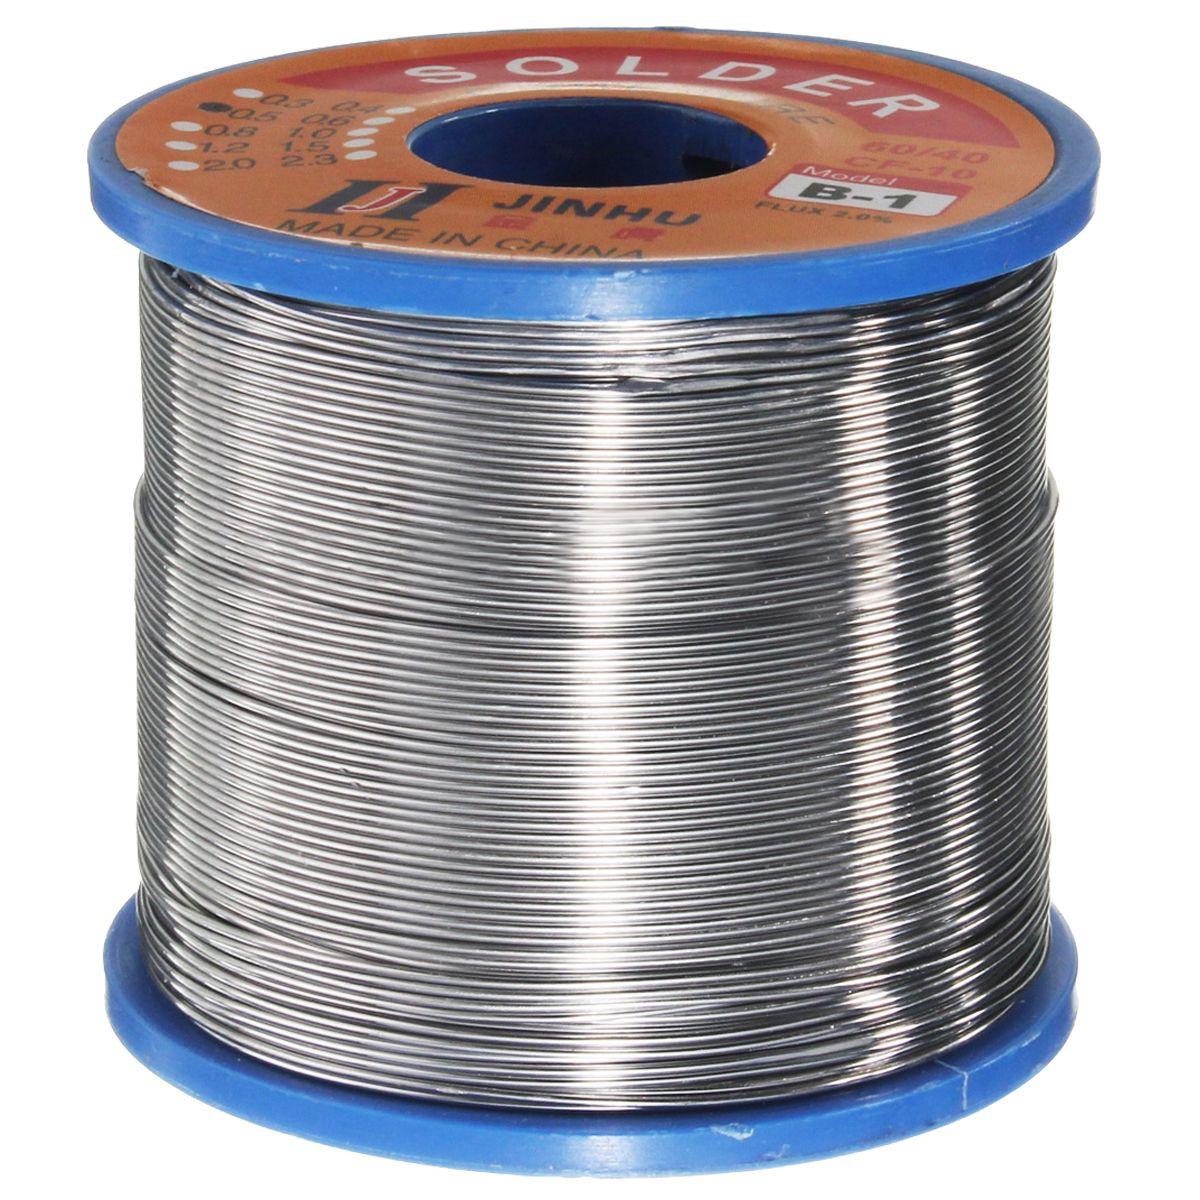 400g 60/40 Zinn blei Solder Flux Draht Kolophonium Core Löten Rolle 0,5mm